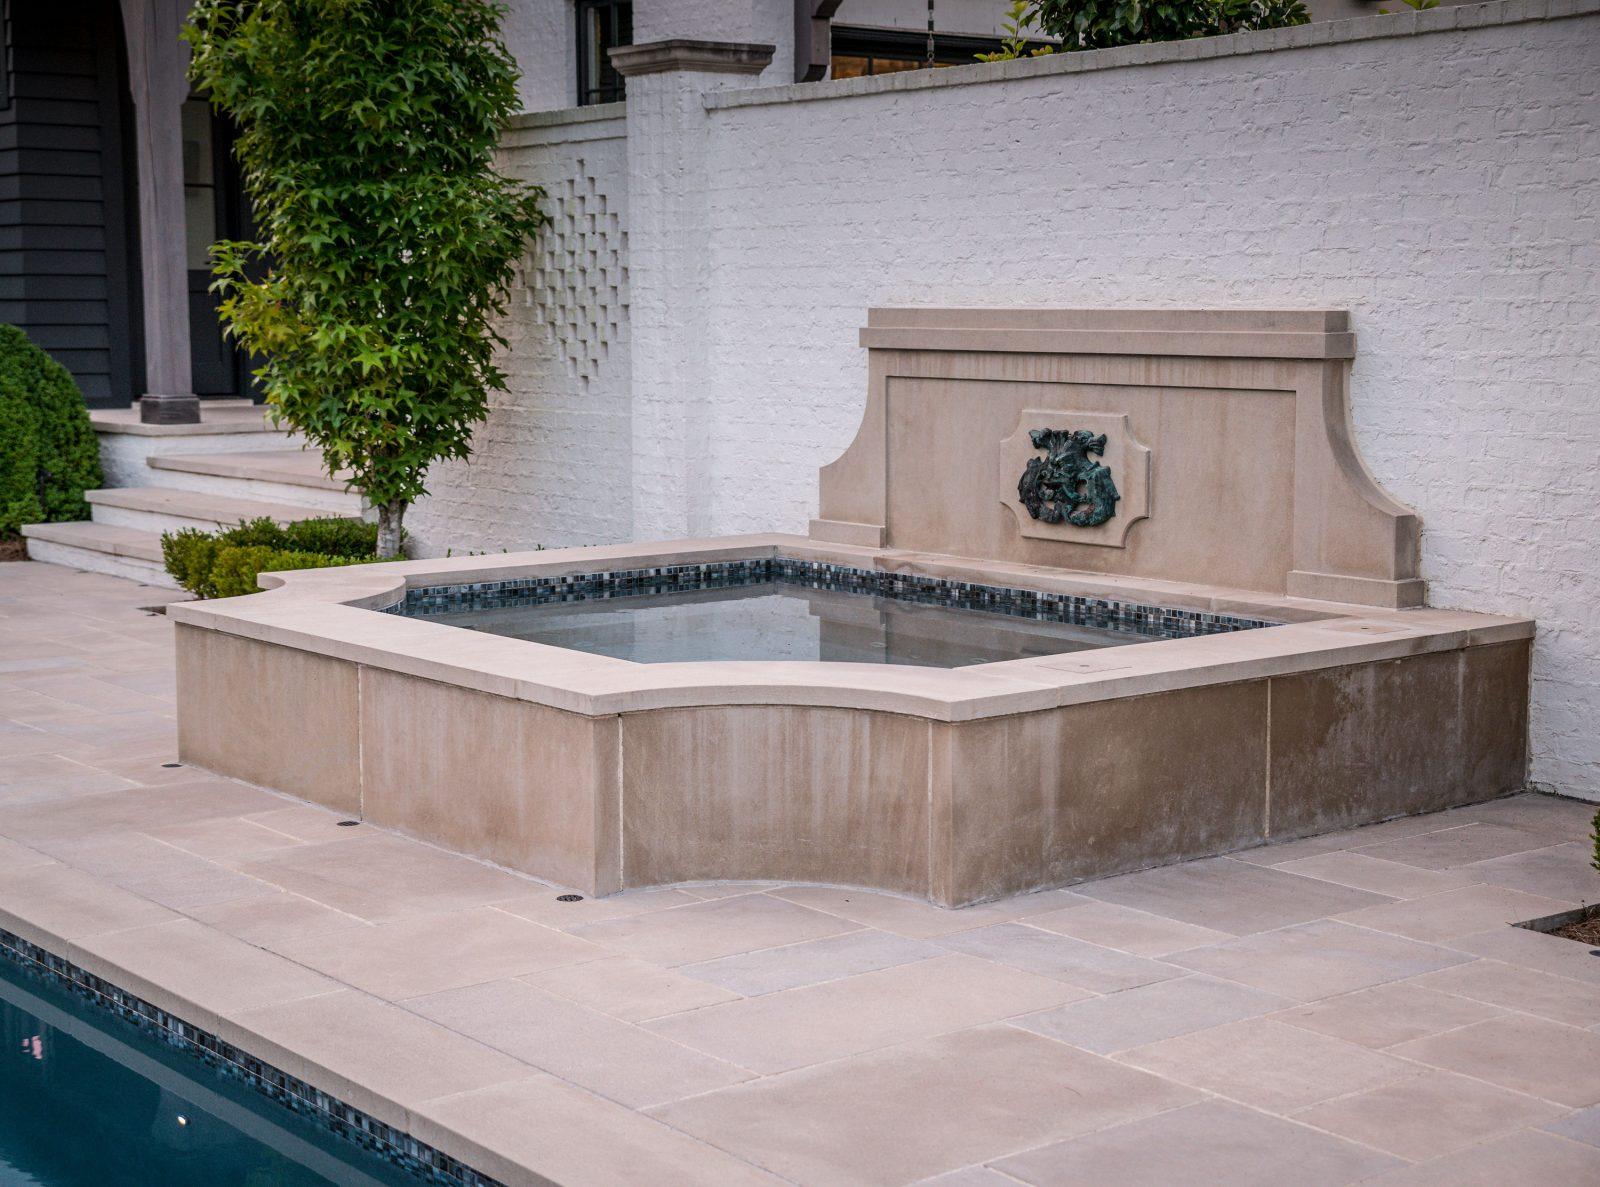 Small hot tub spa in the backyard next to the main backyard pool